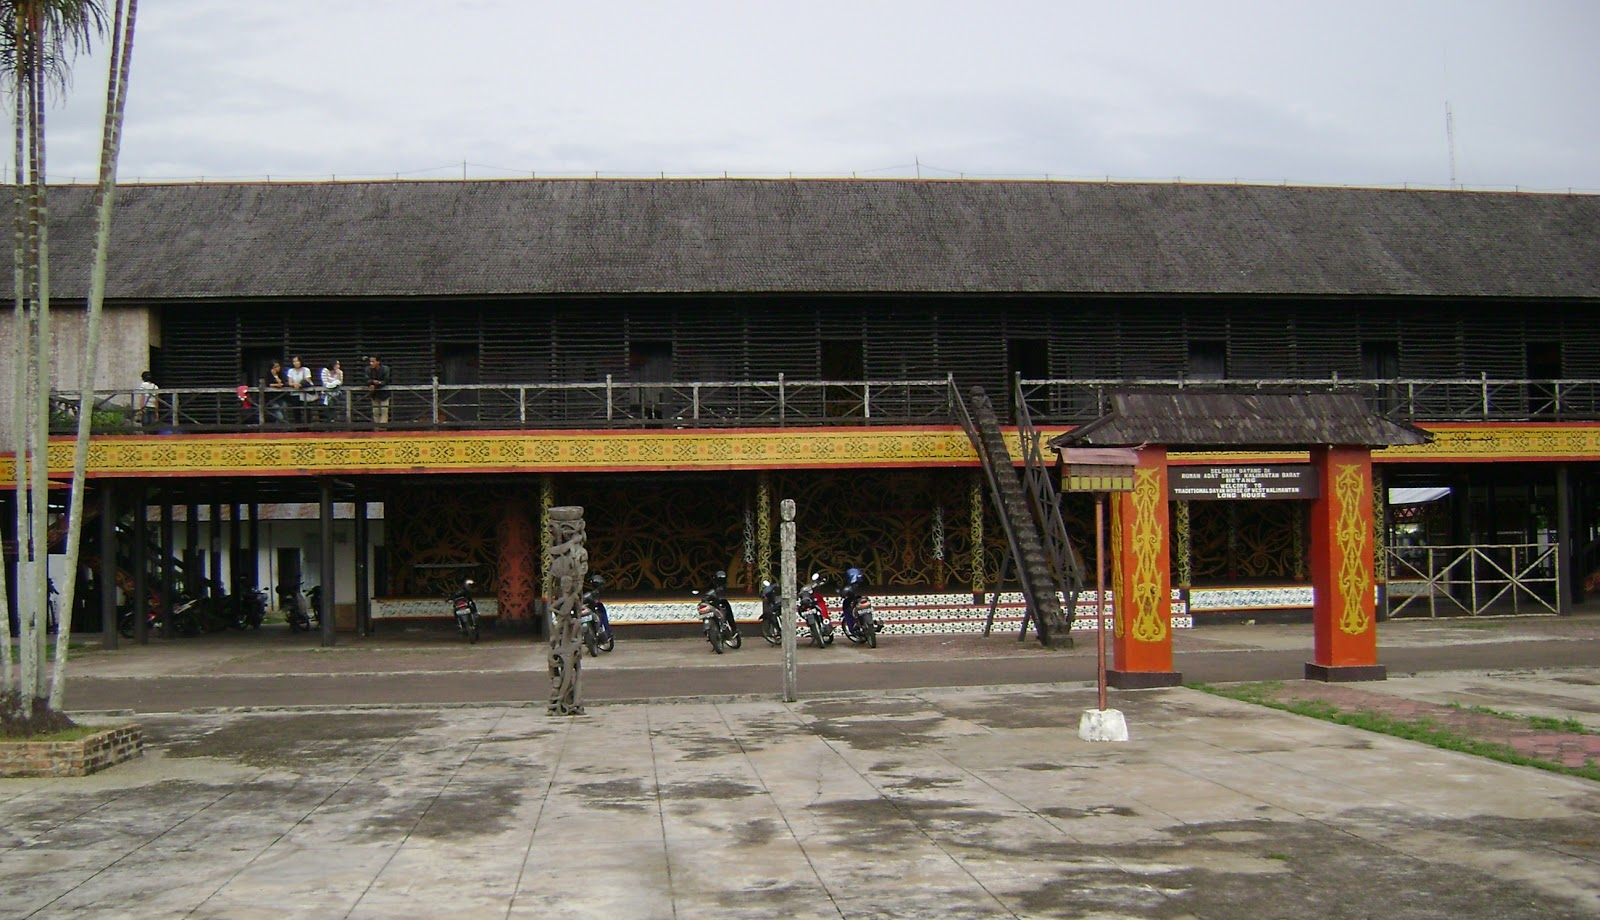 Download this Kalimantan Selatan picture